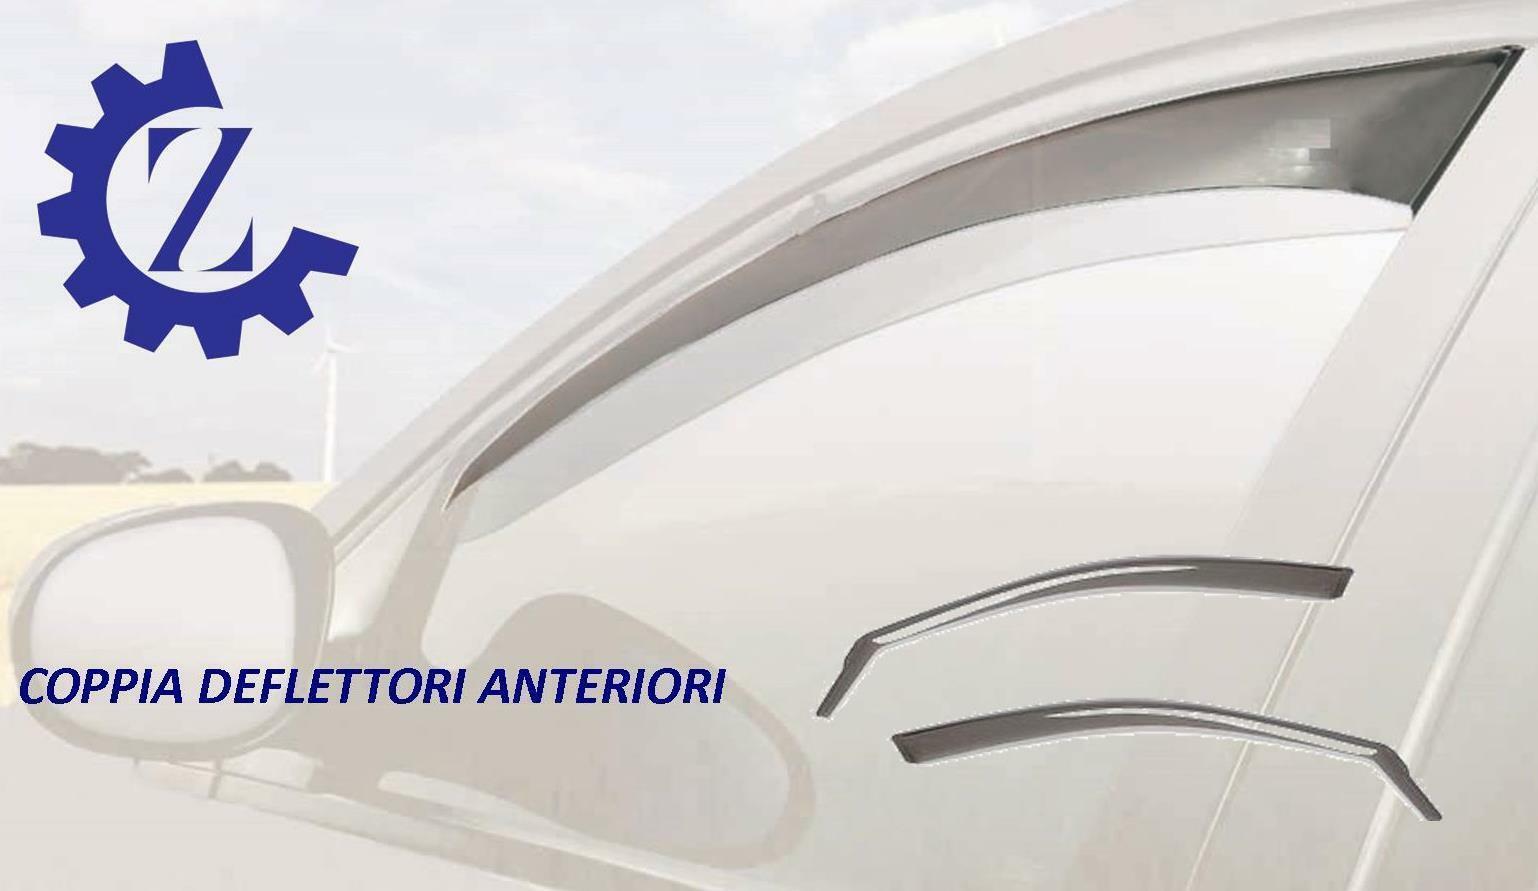 DEFLETTORI ARIA ANTITURBO PER VW GOLF 92- 3 PORTE